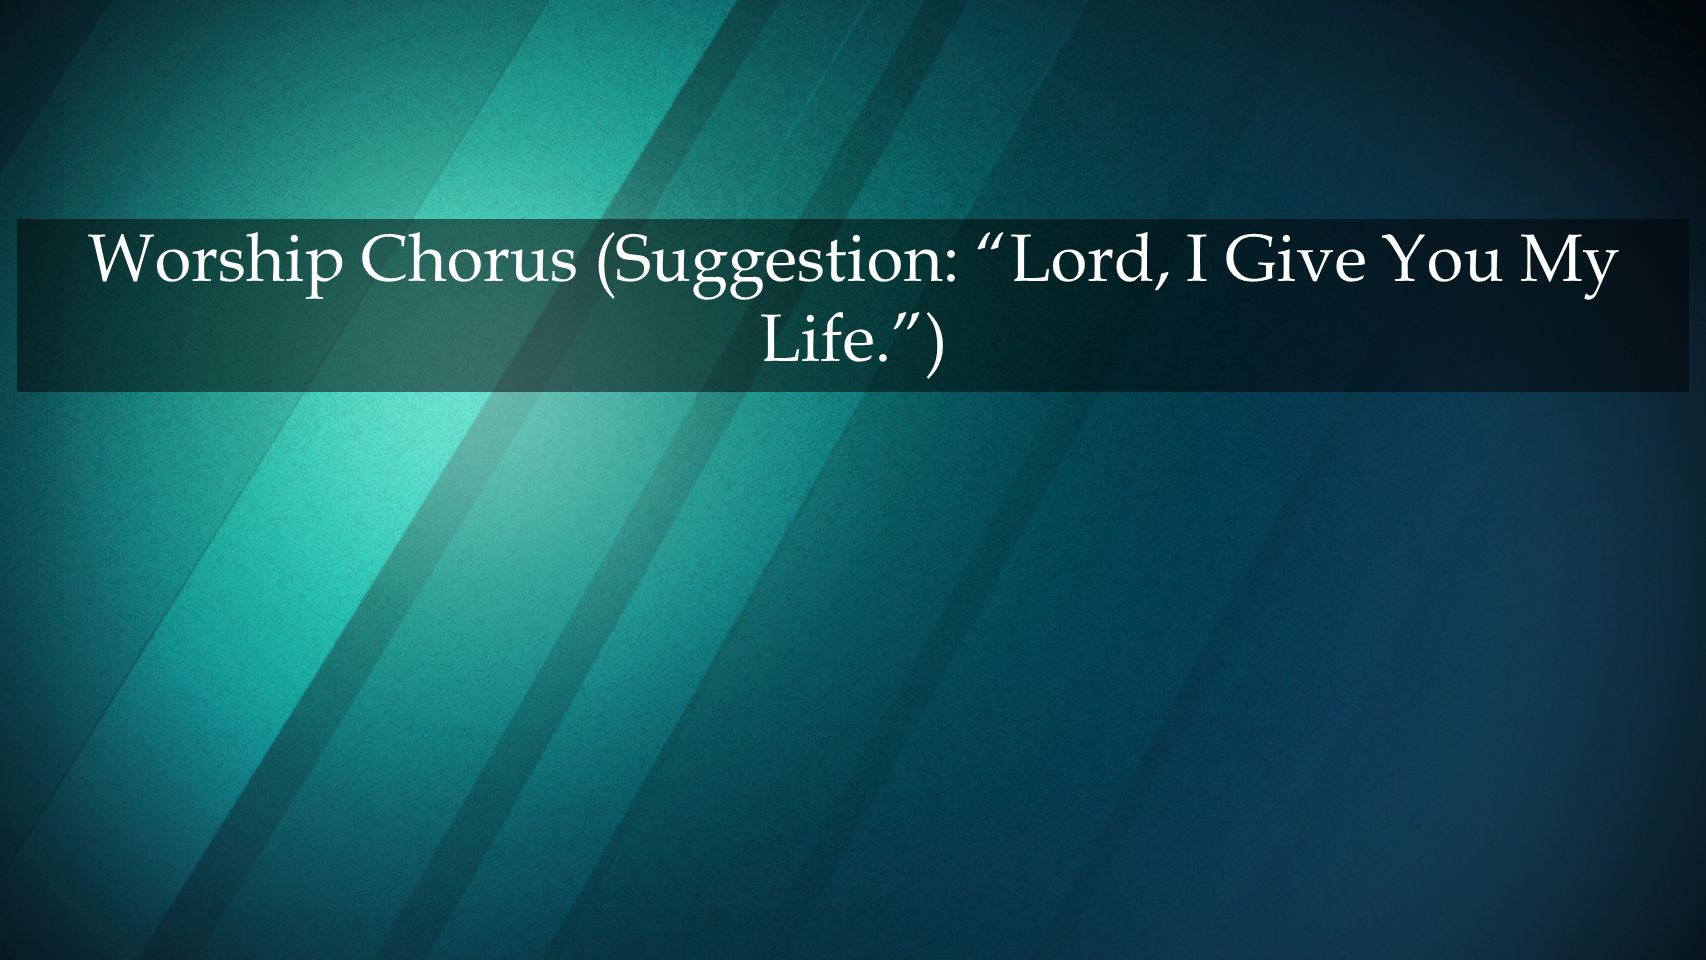 Worship Chorus (Suggestion: Lord, I Give You My Life. )